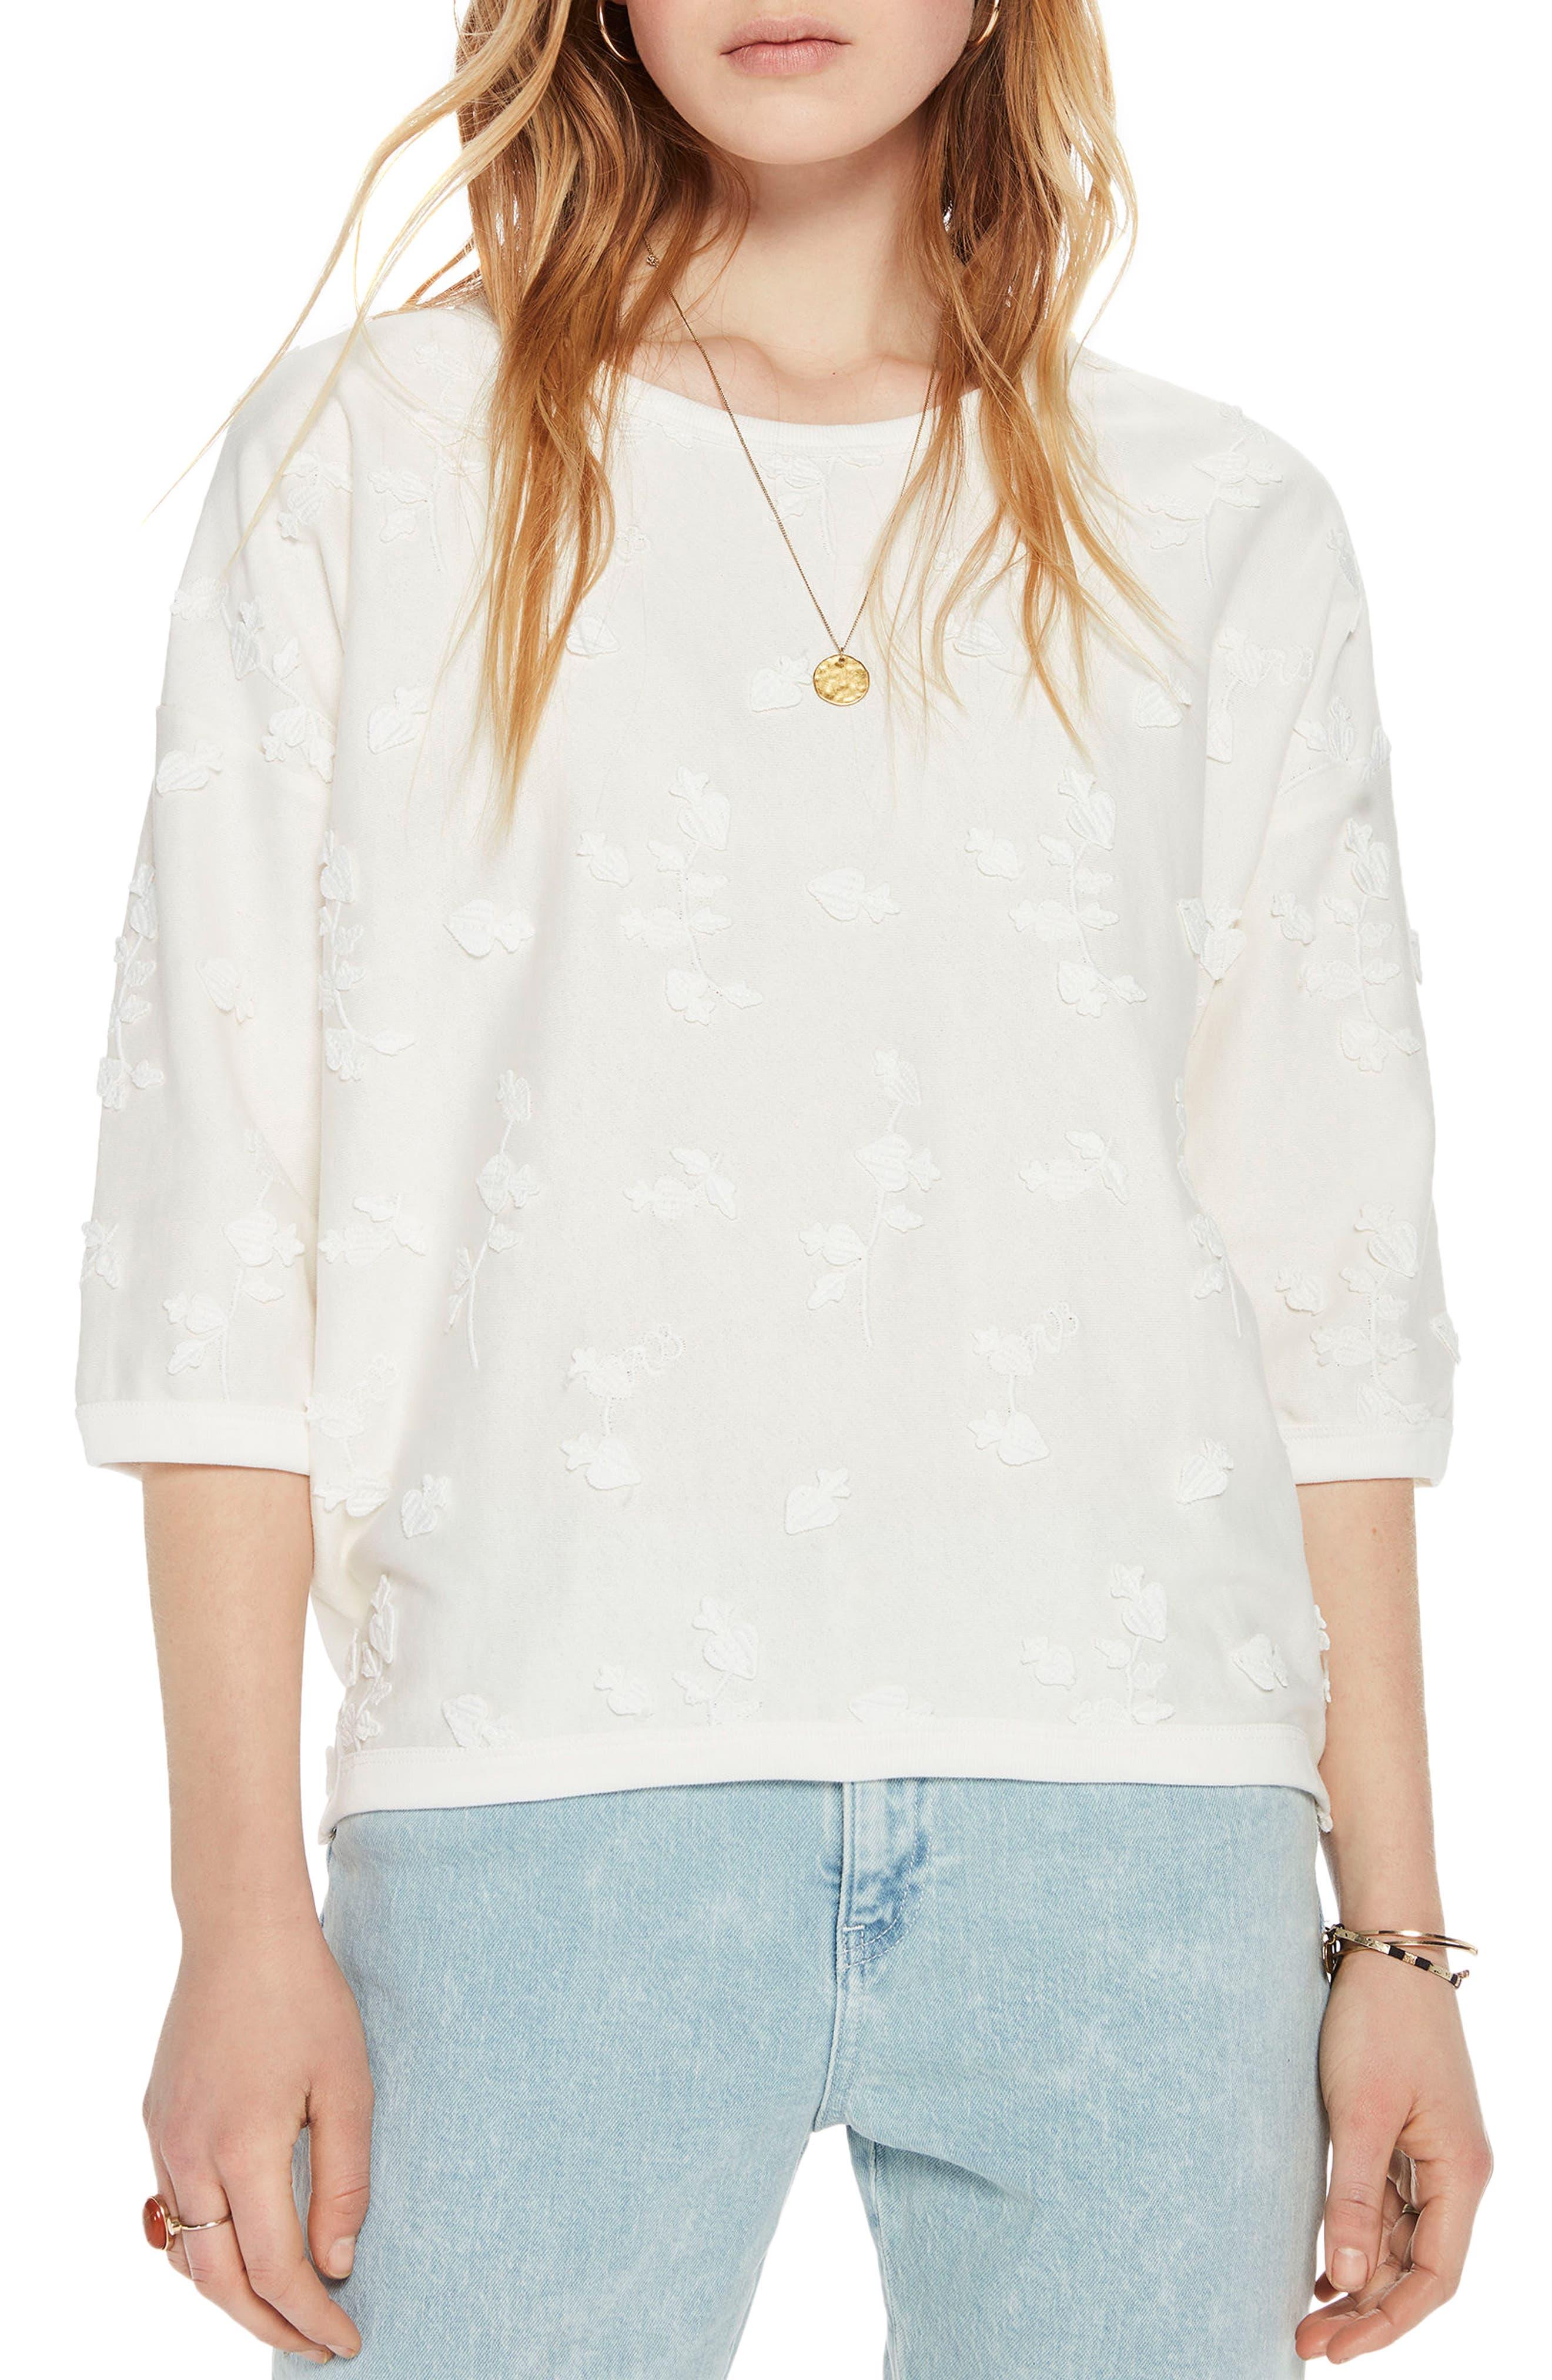 Tonal Embroidered Sweatshirt,                             Main thumbnail 1, color,                             01 Denim White